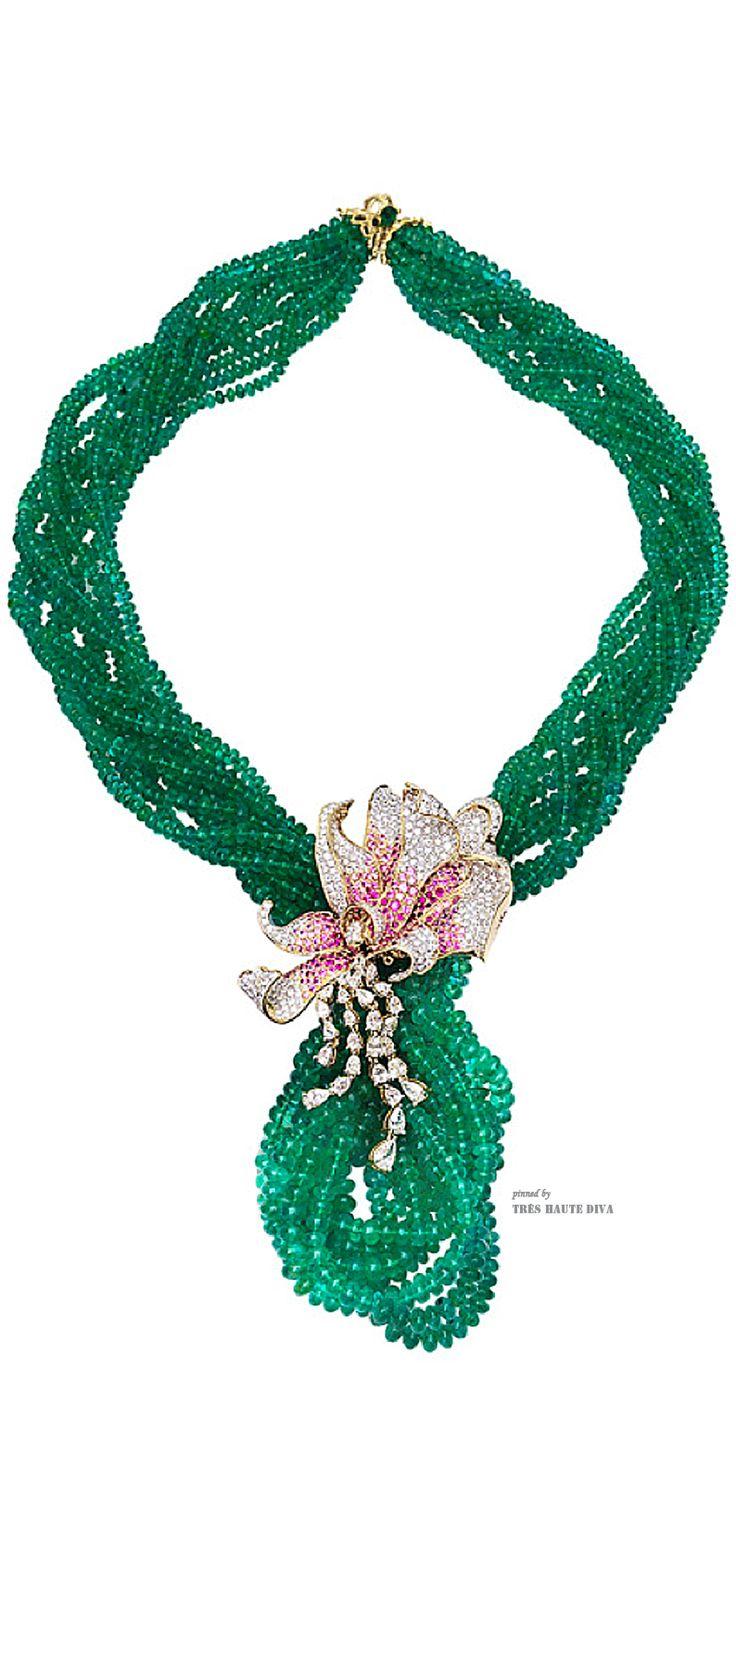 http://rubies.work/0012-emerald/ 0586-emerald-rings/ Farah Khan Zambian Emerald with Flower Pendant Necklace♥•♥•♥